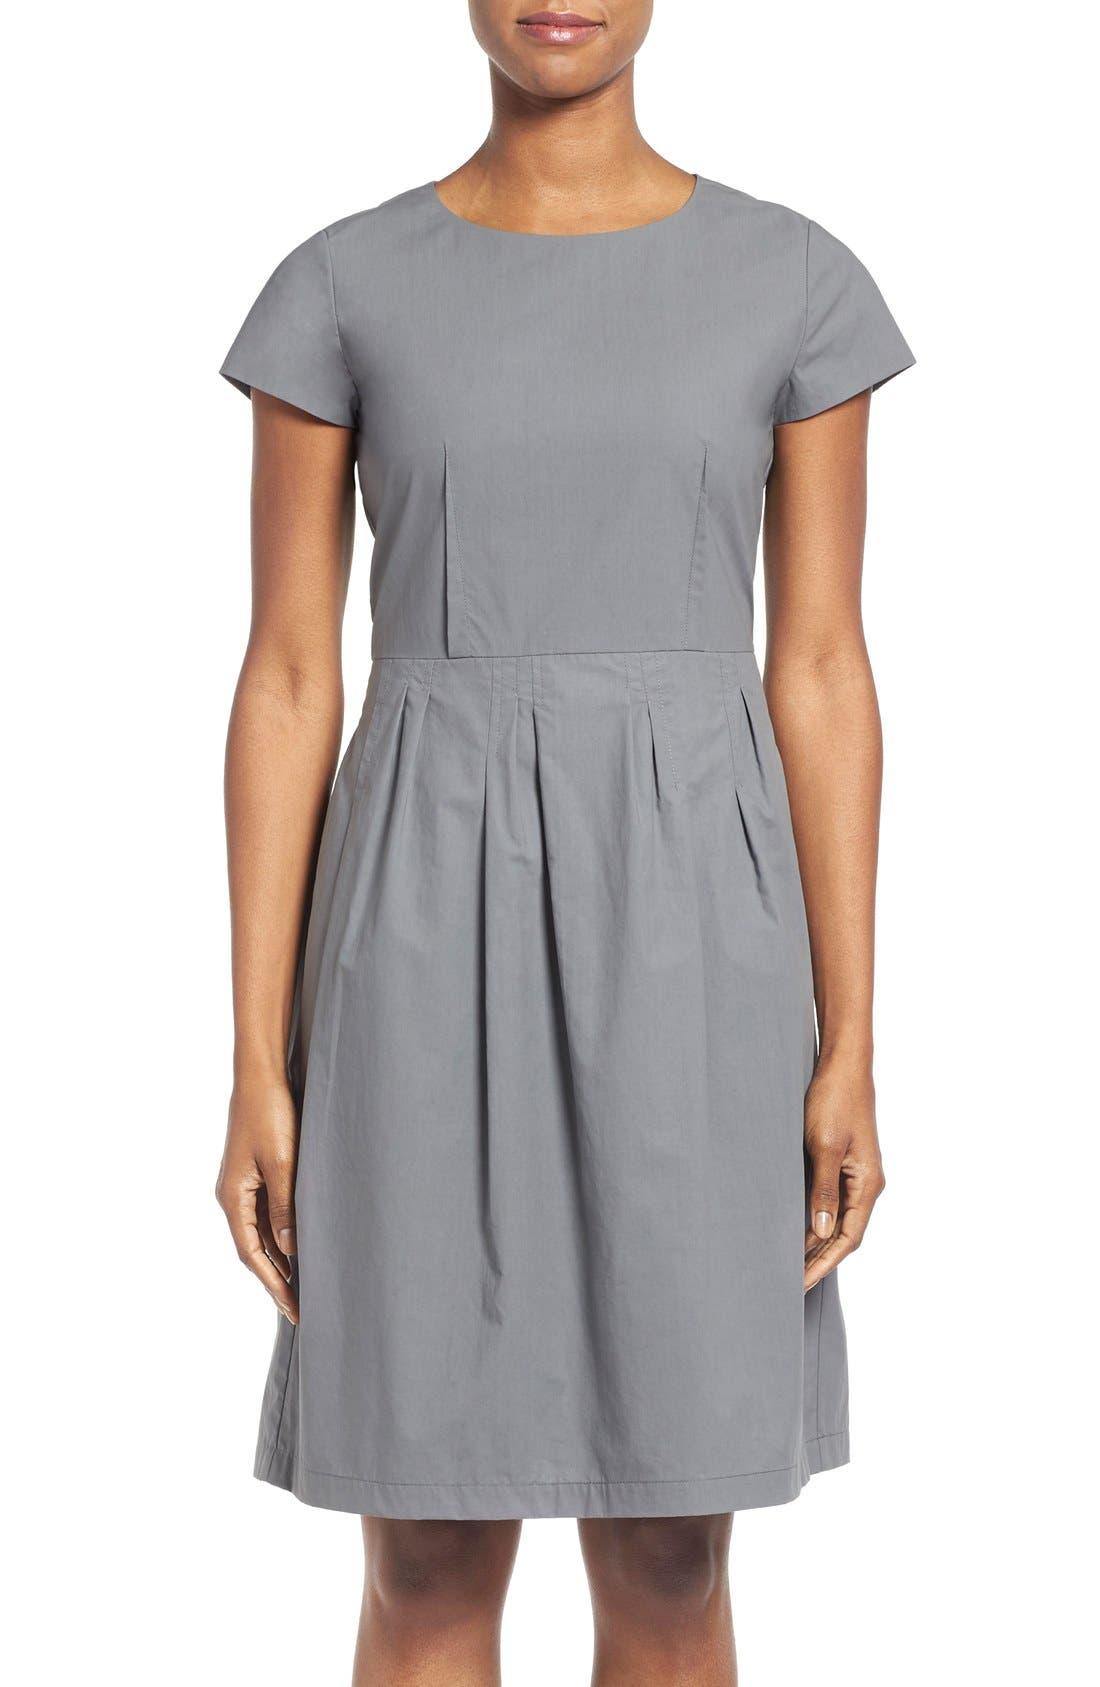 Main Image - Lafayette 148 New York 'Gina' Cap Sleeve Fit & Flare Dress